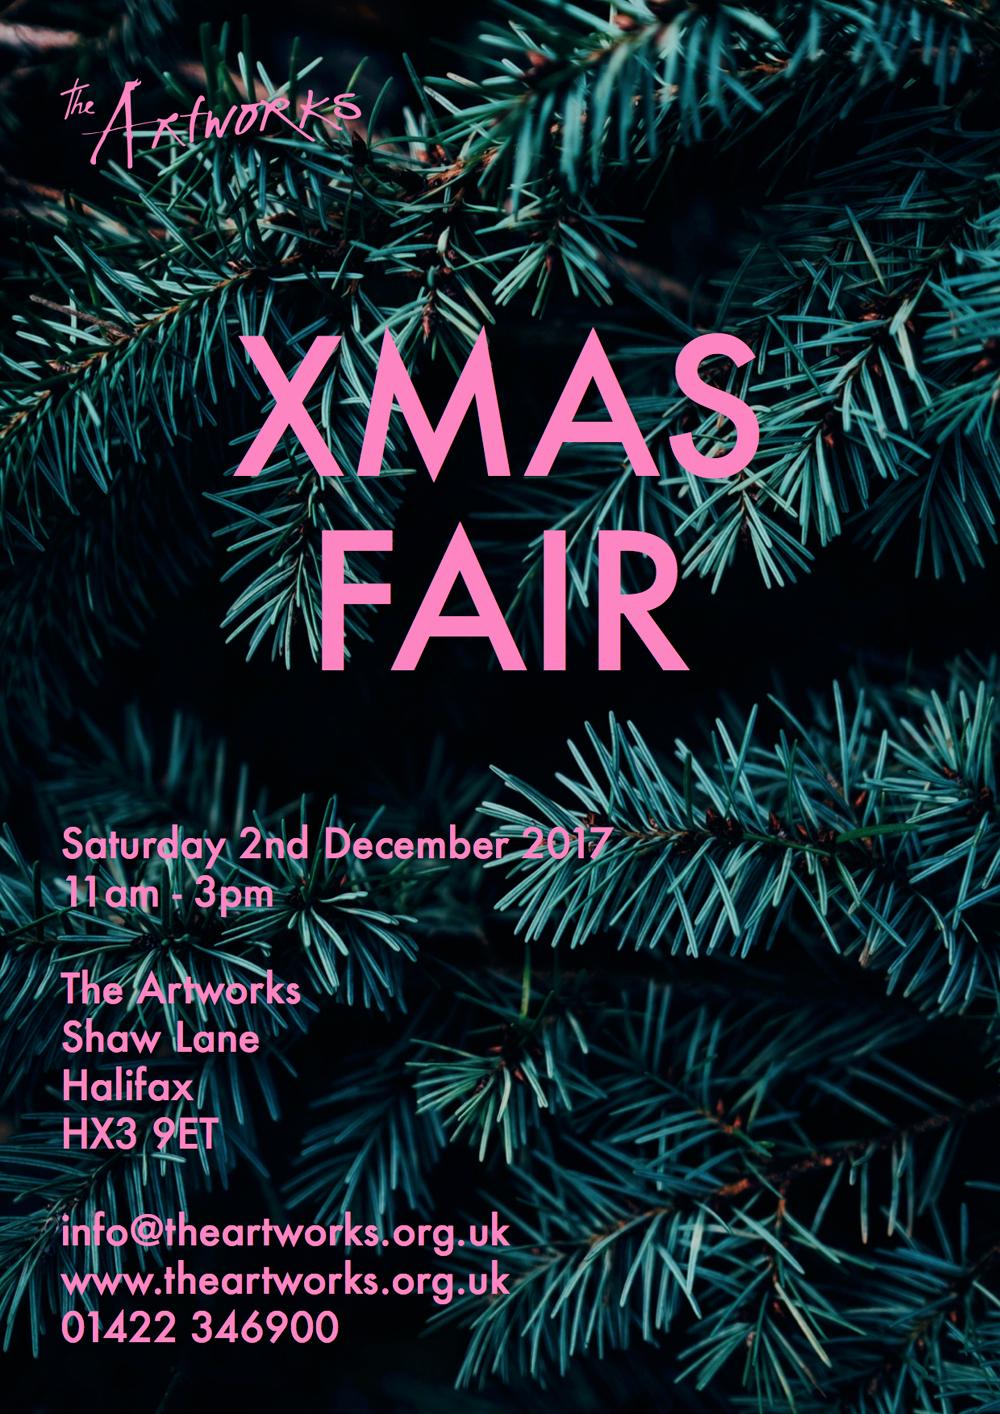 the-artworks-xmas-fair-2017.jpg